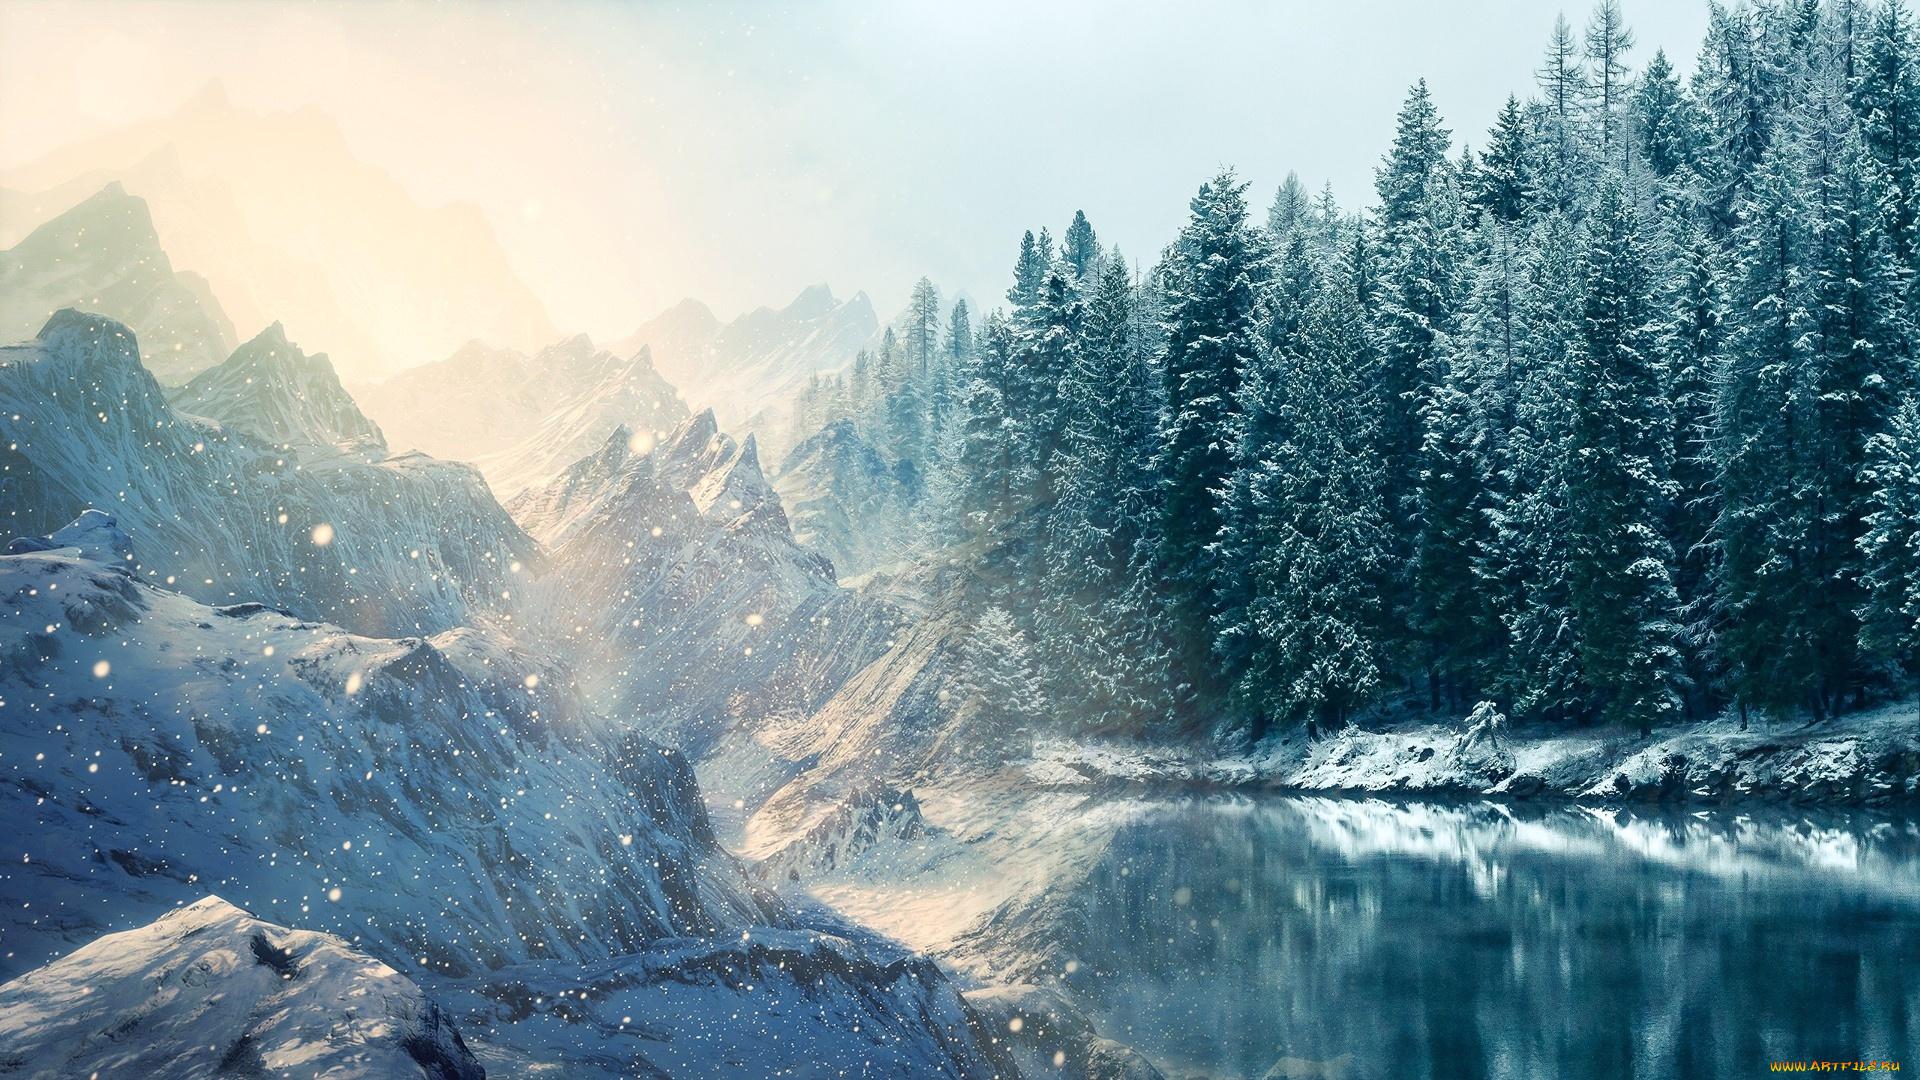 природа скалы деревья горы снег зима nature rock trees mountains snow winter бесплатно